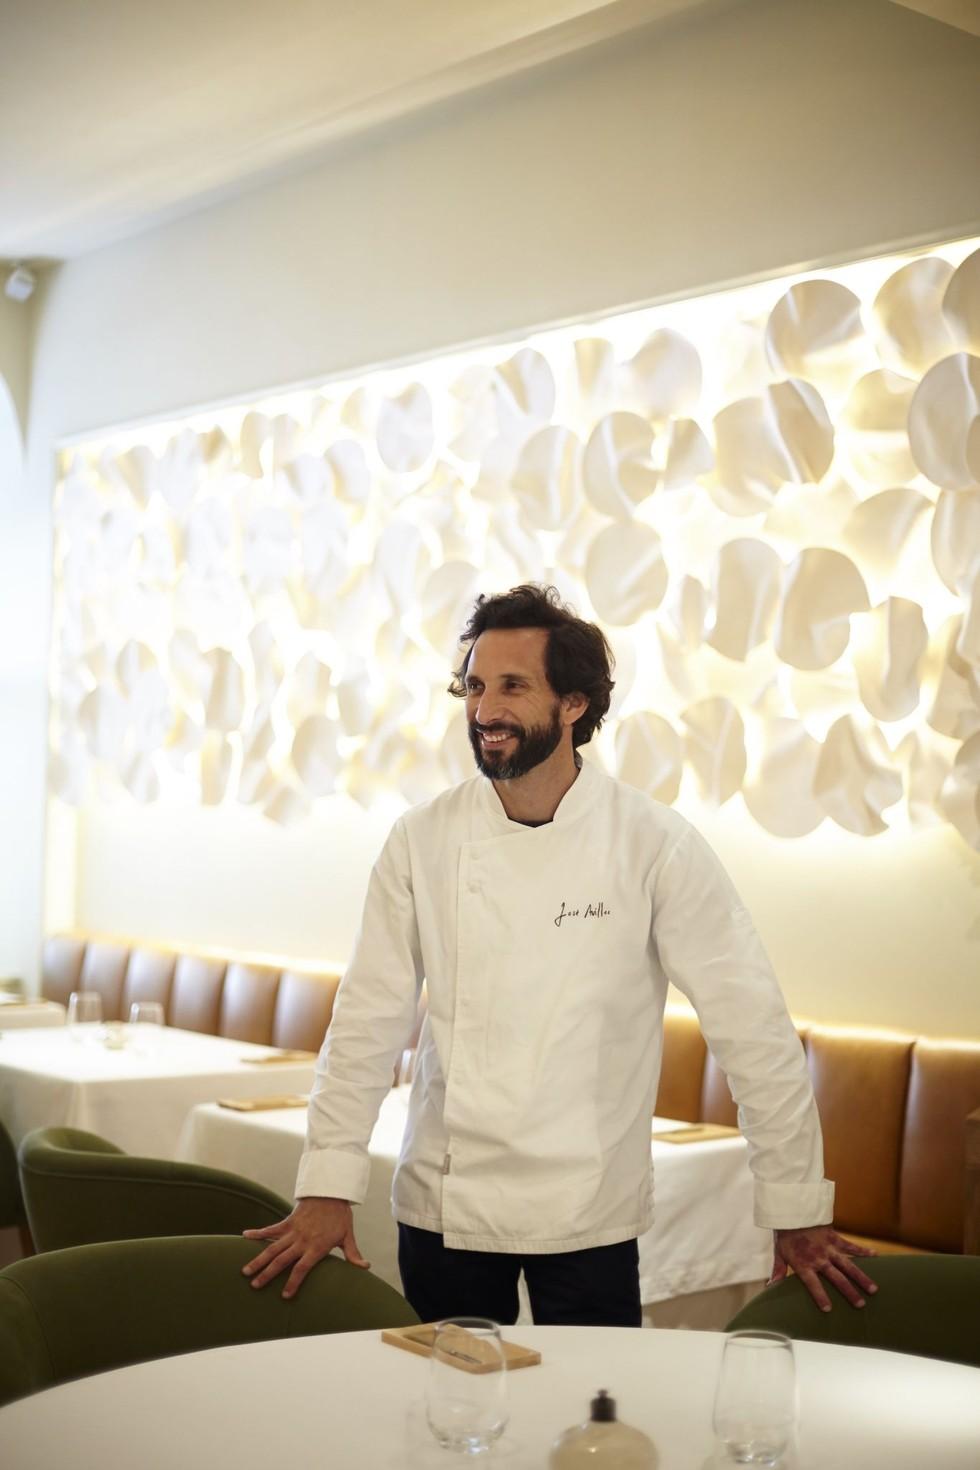 José Avillez, who is a chef in Lisbon